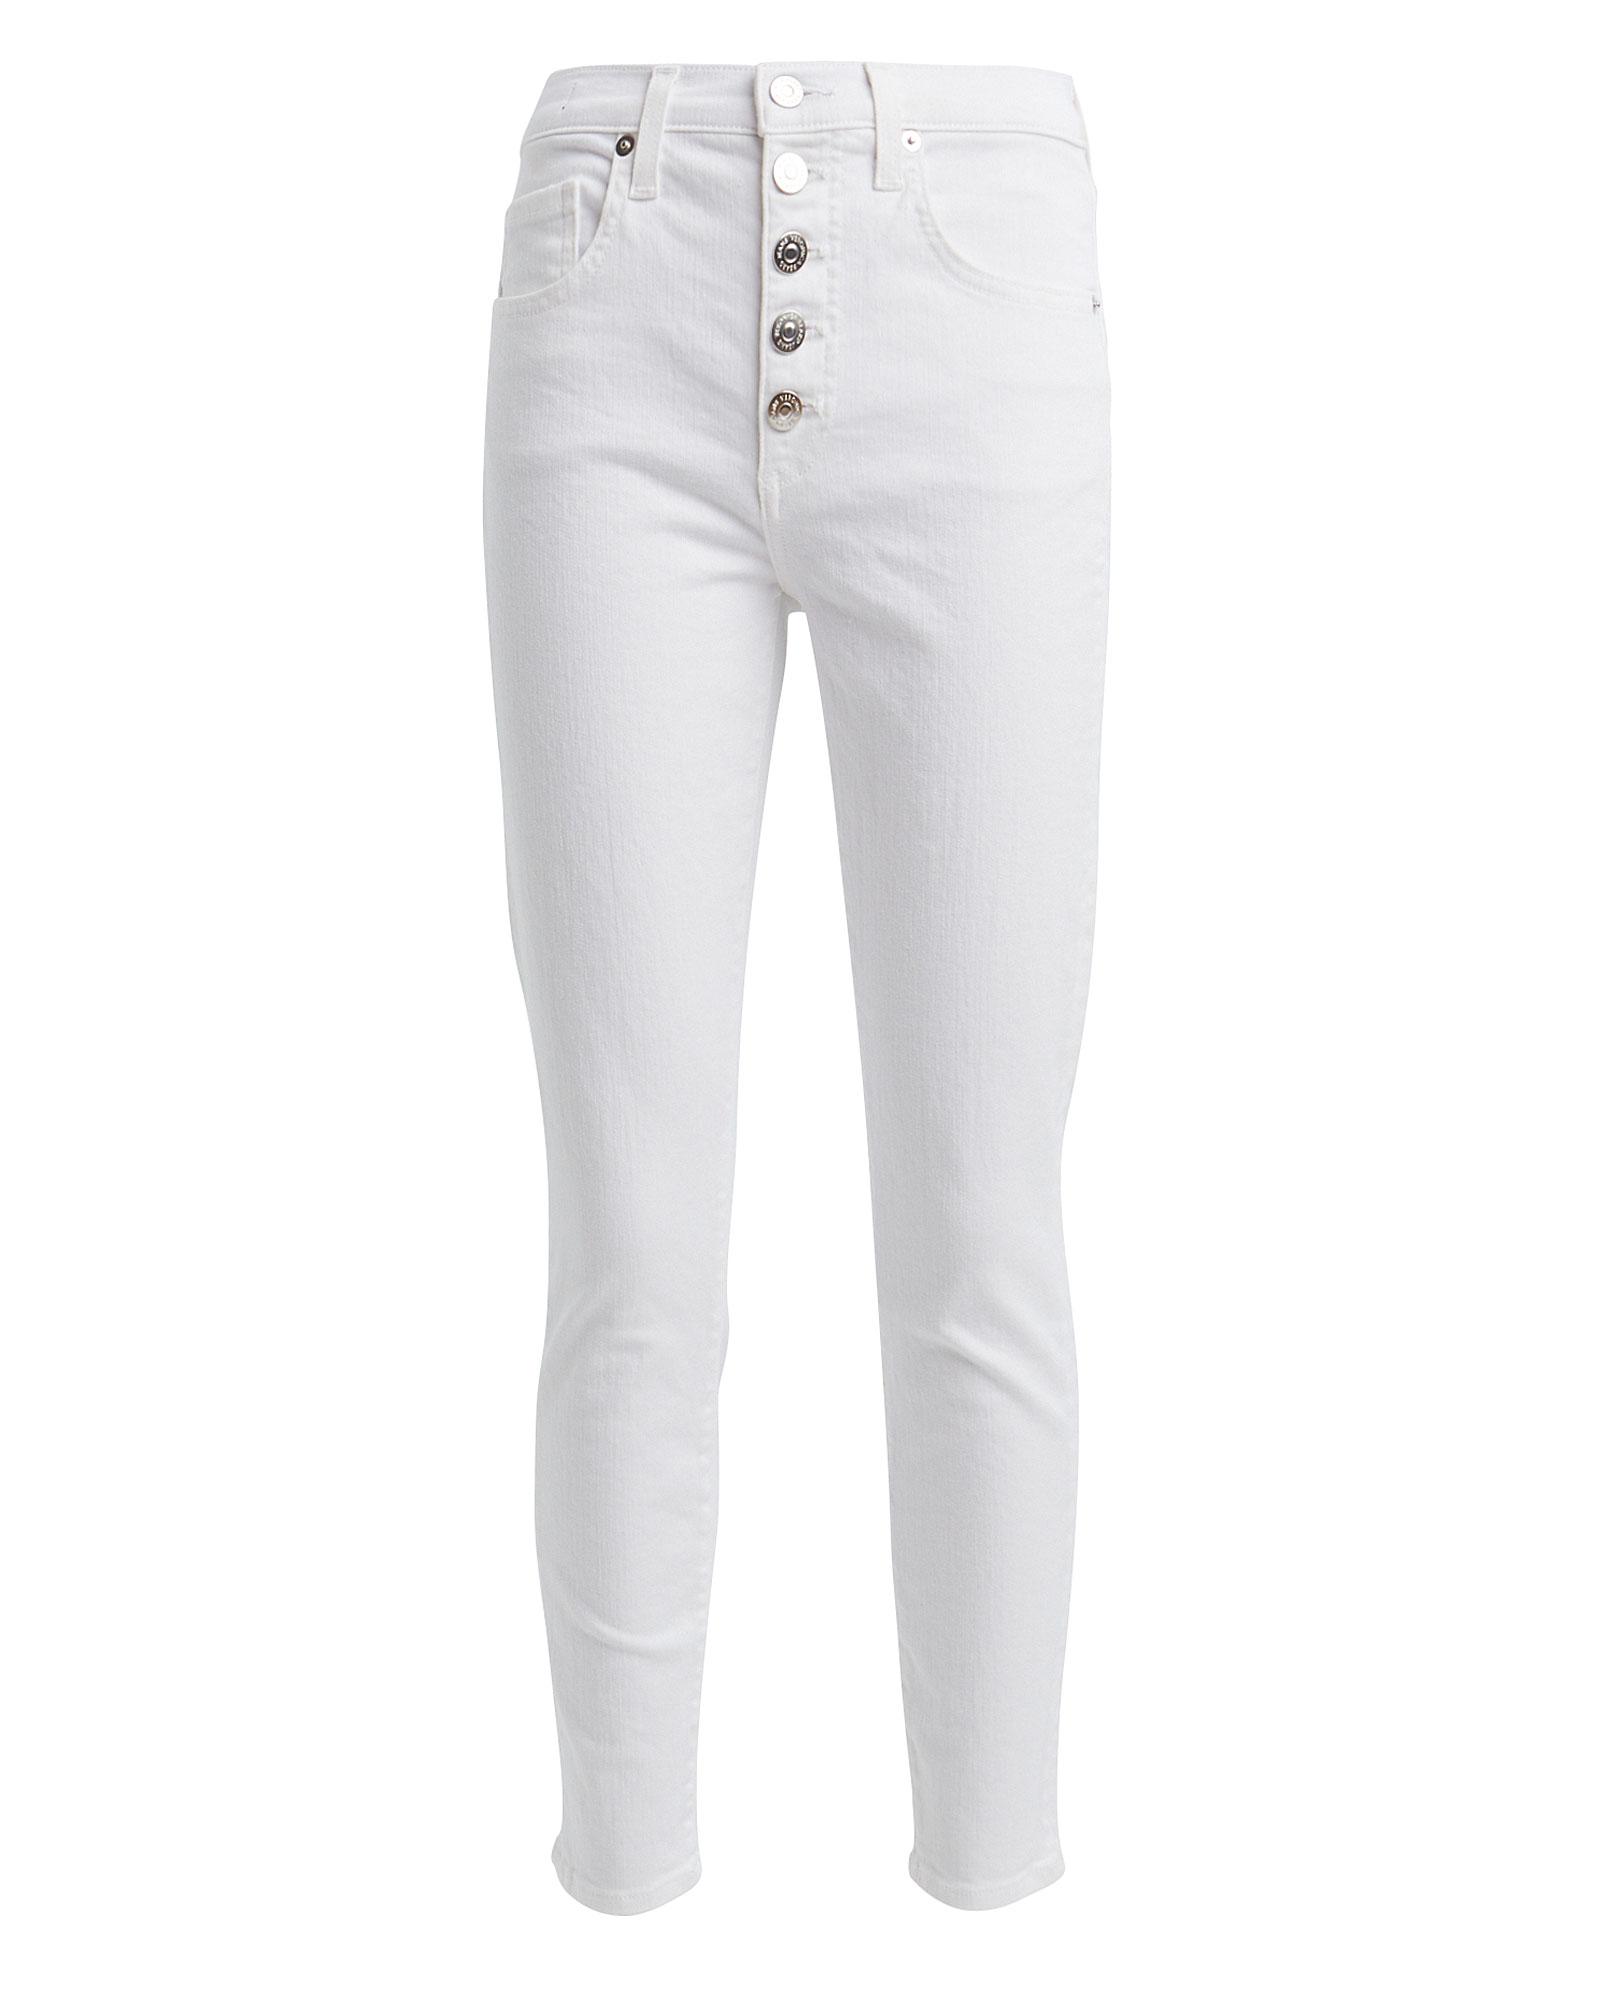 Veronica Beard Jeans VERONICA BEARD DEBBIE HIGH-RISE SKINNY JEANS